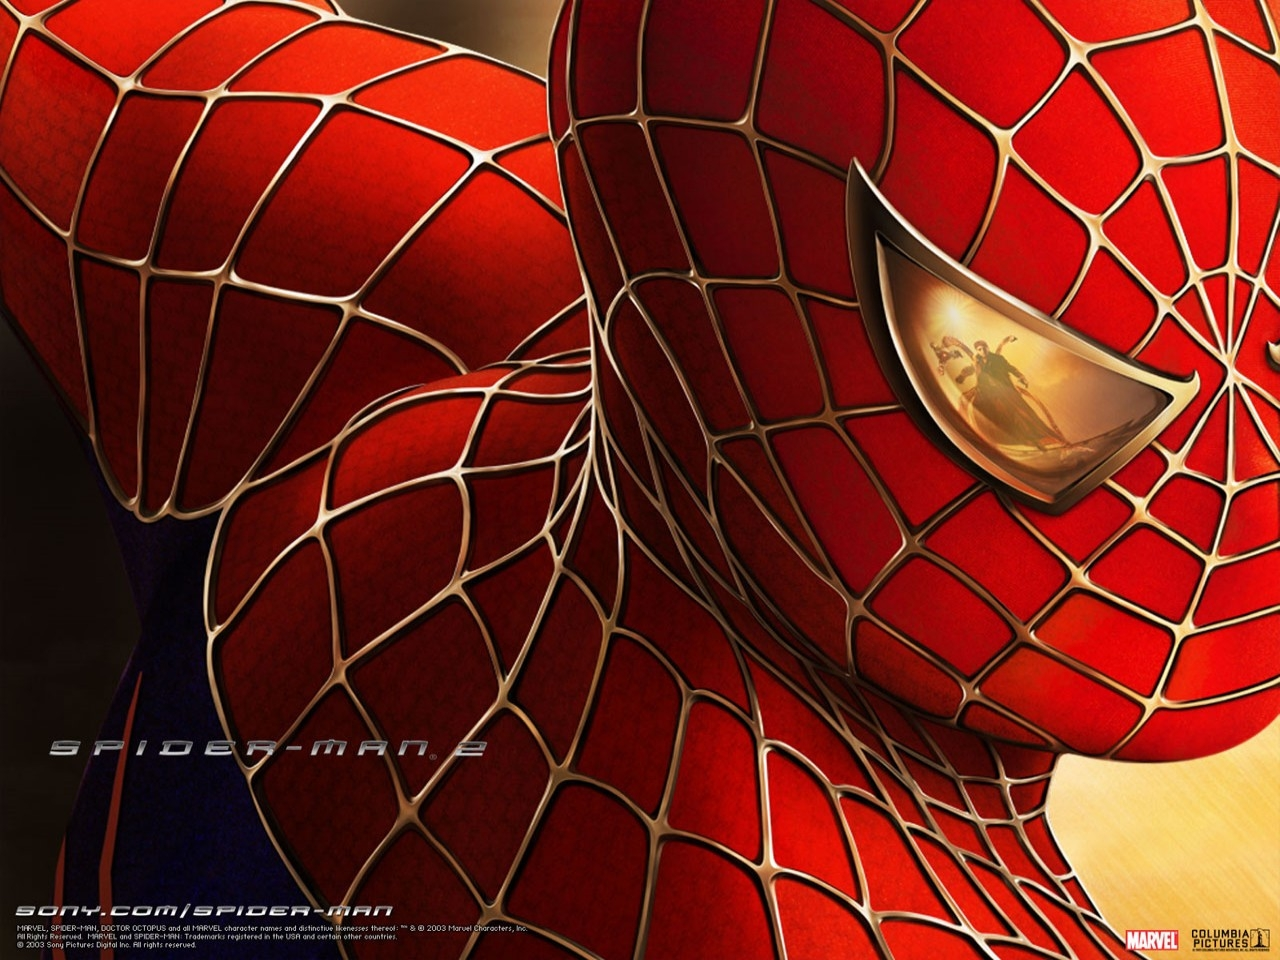 Wallpaper del film Spider-Man 2